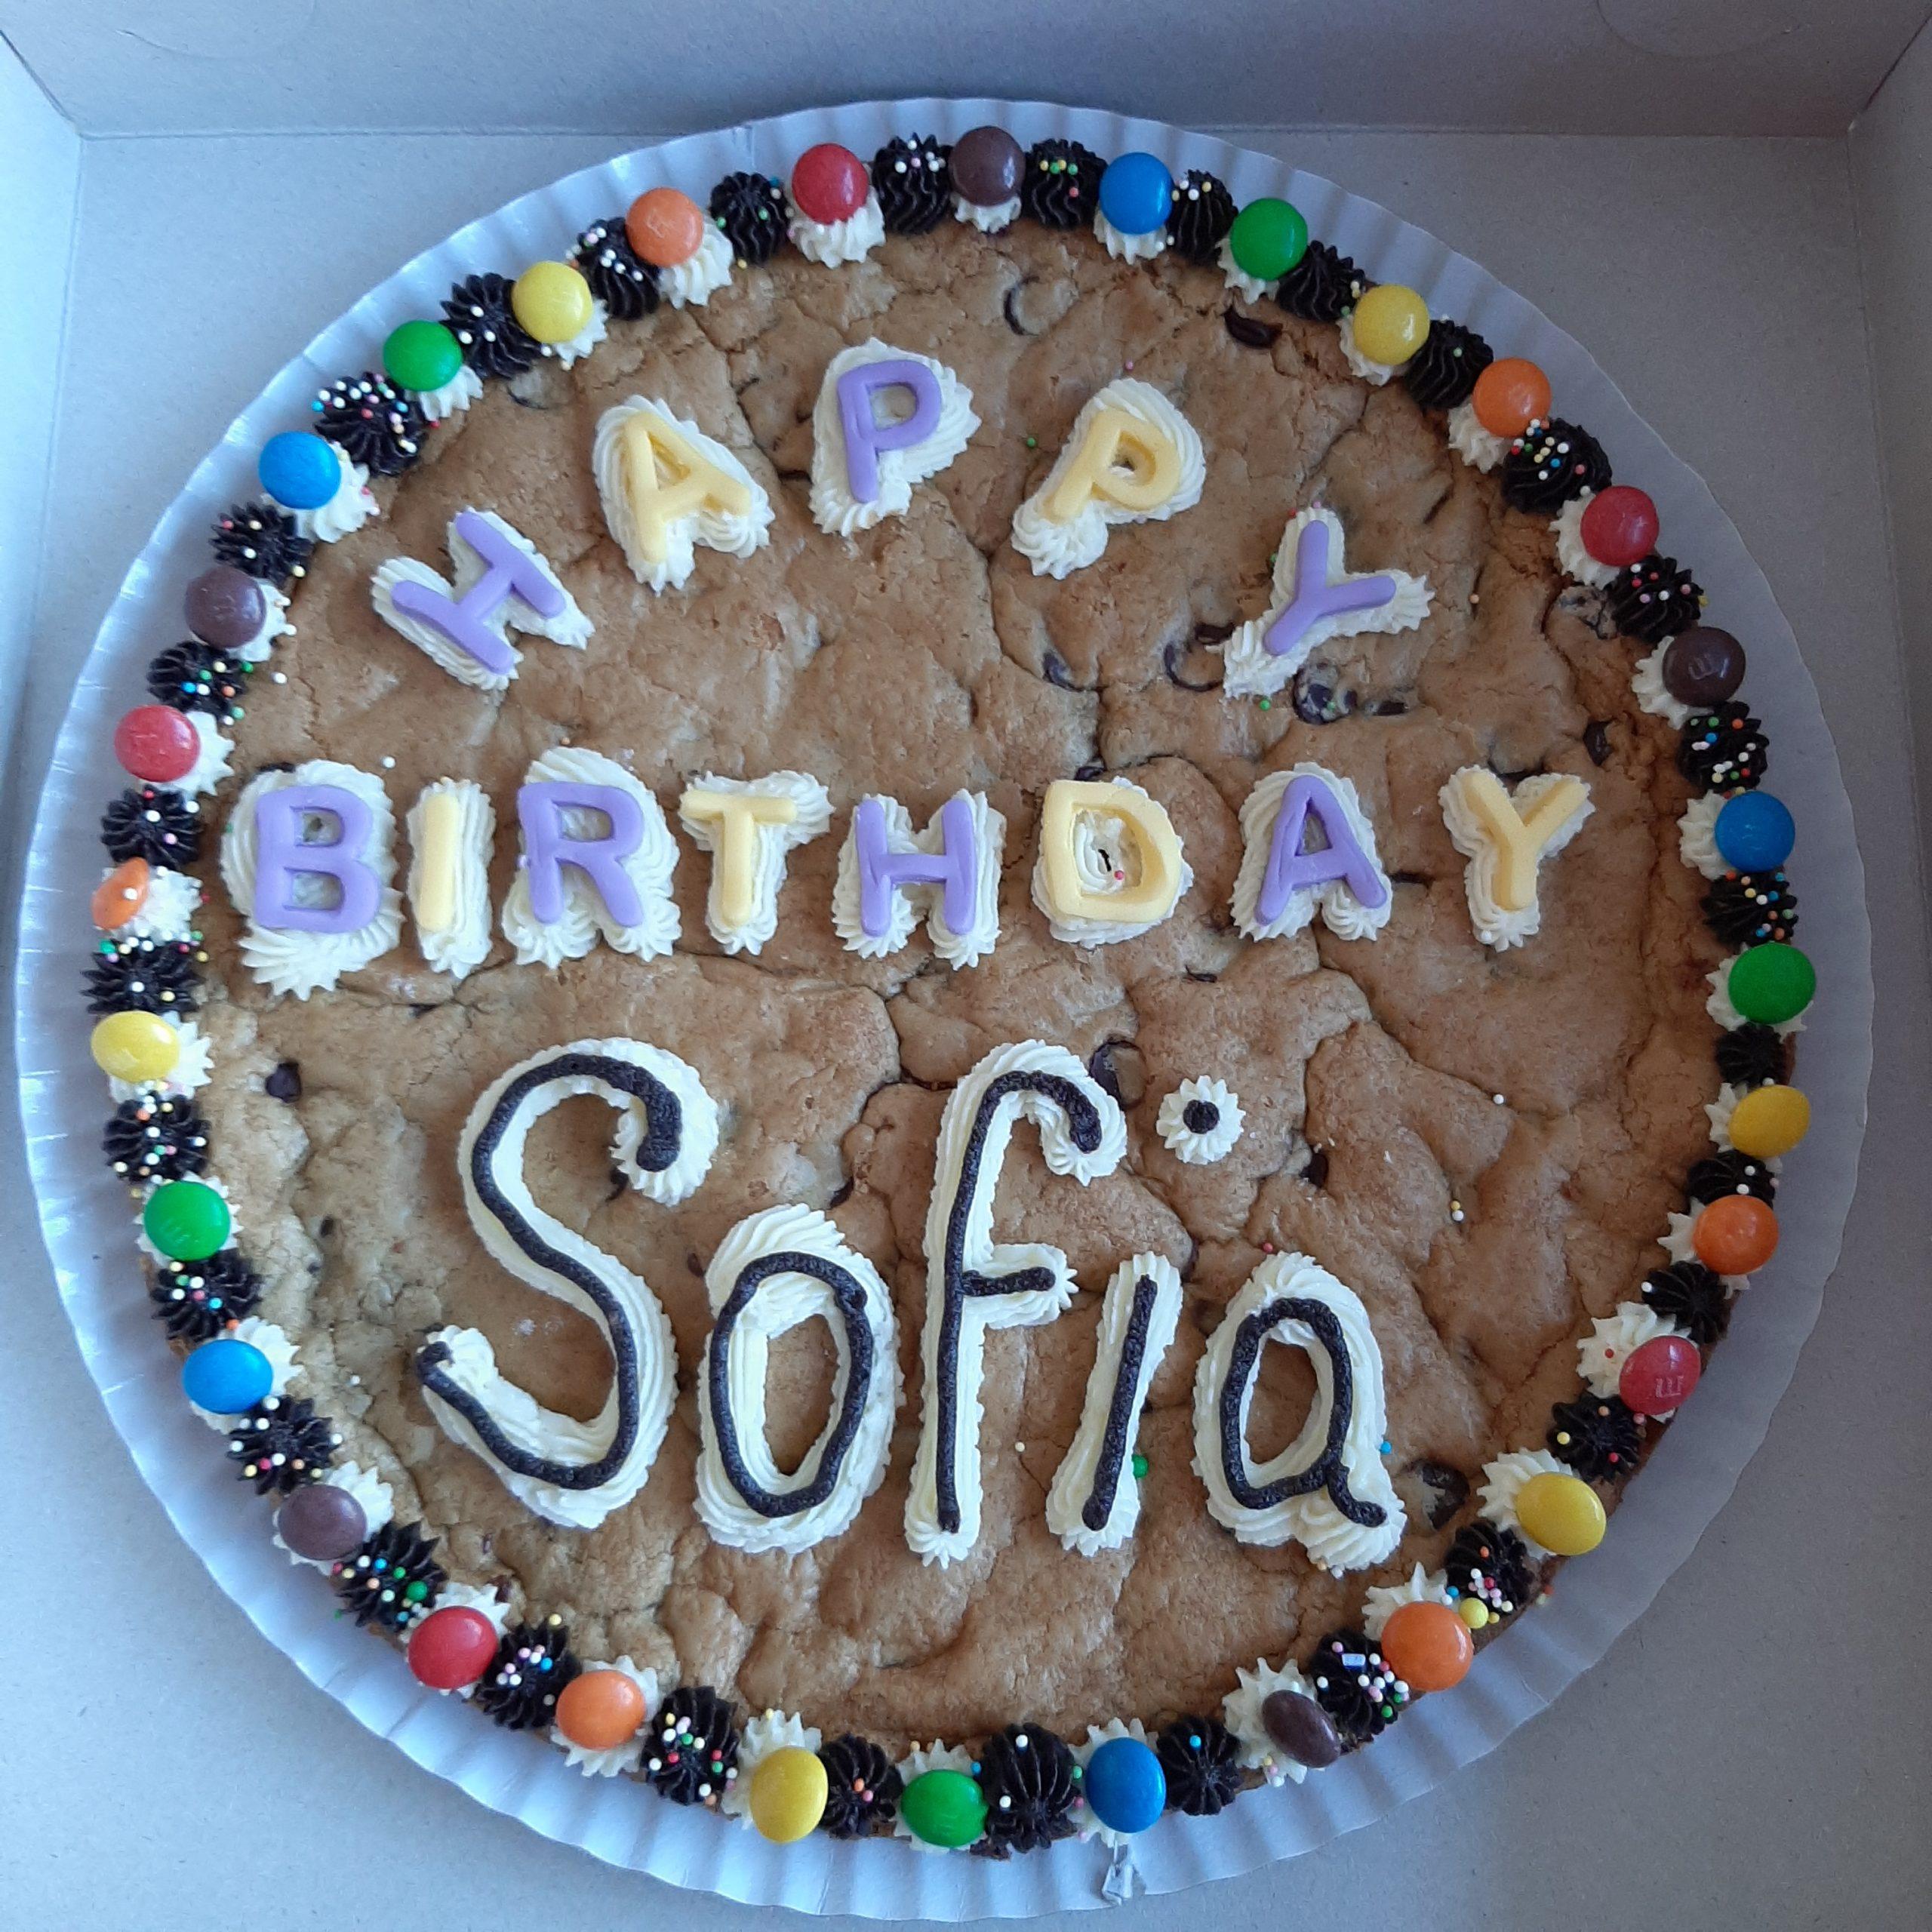 Happy Birthday Sofia cookie cake